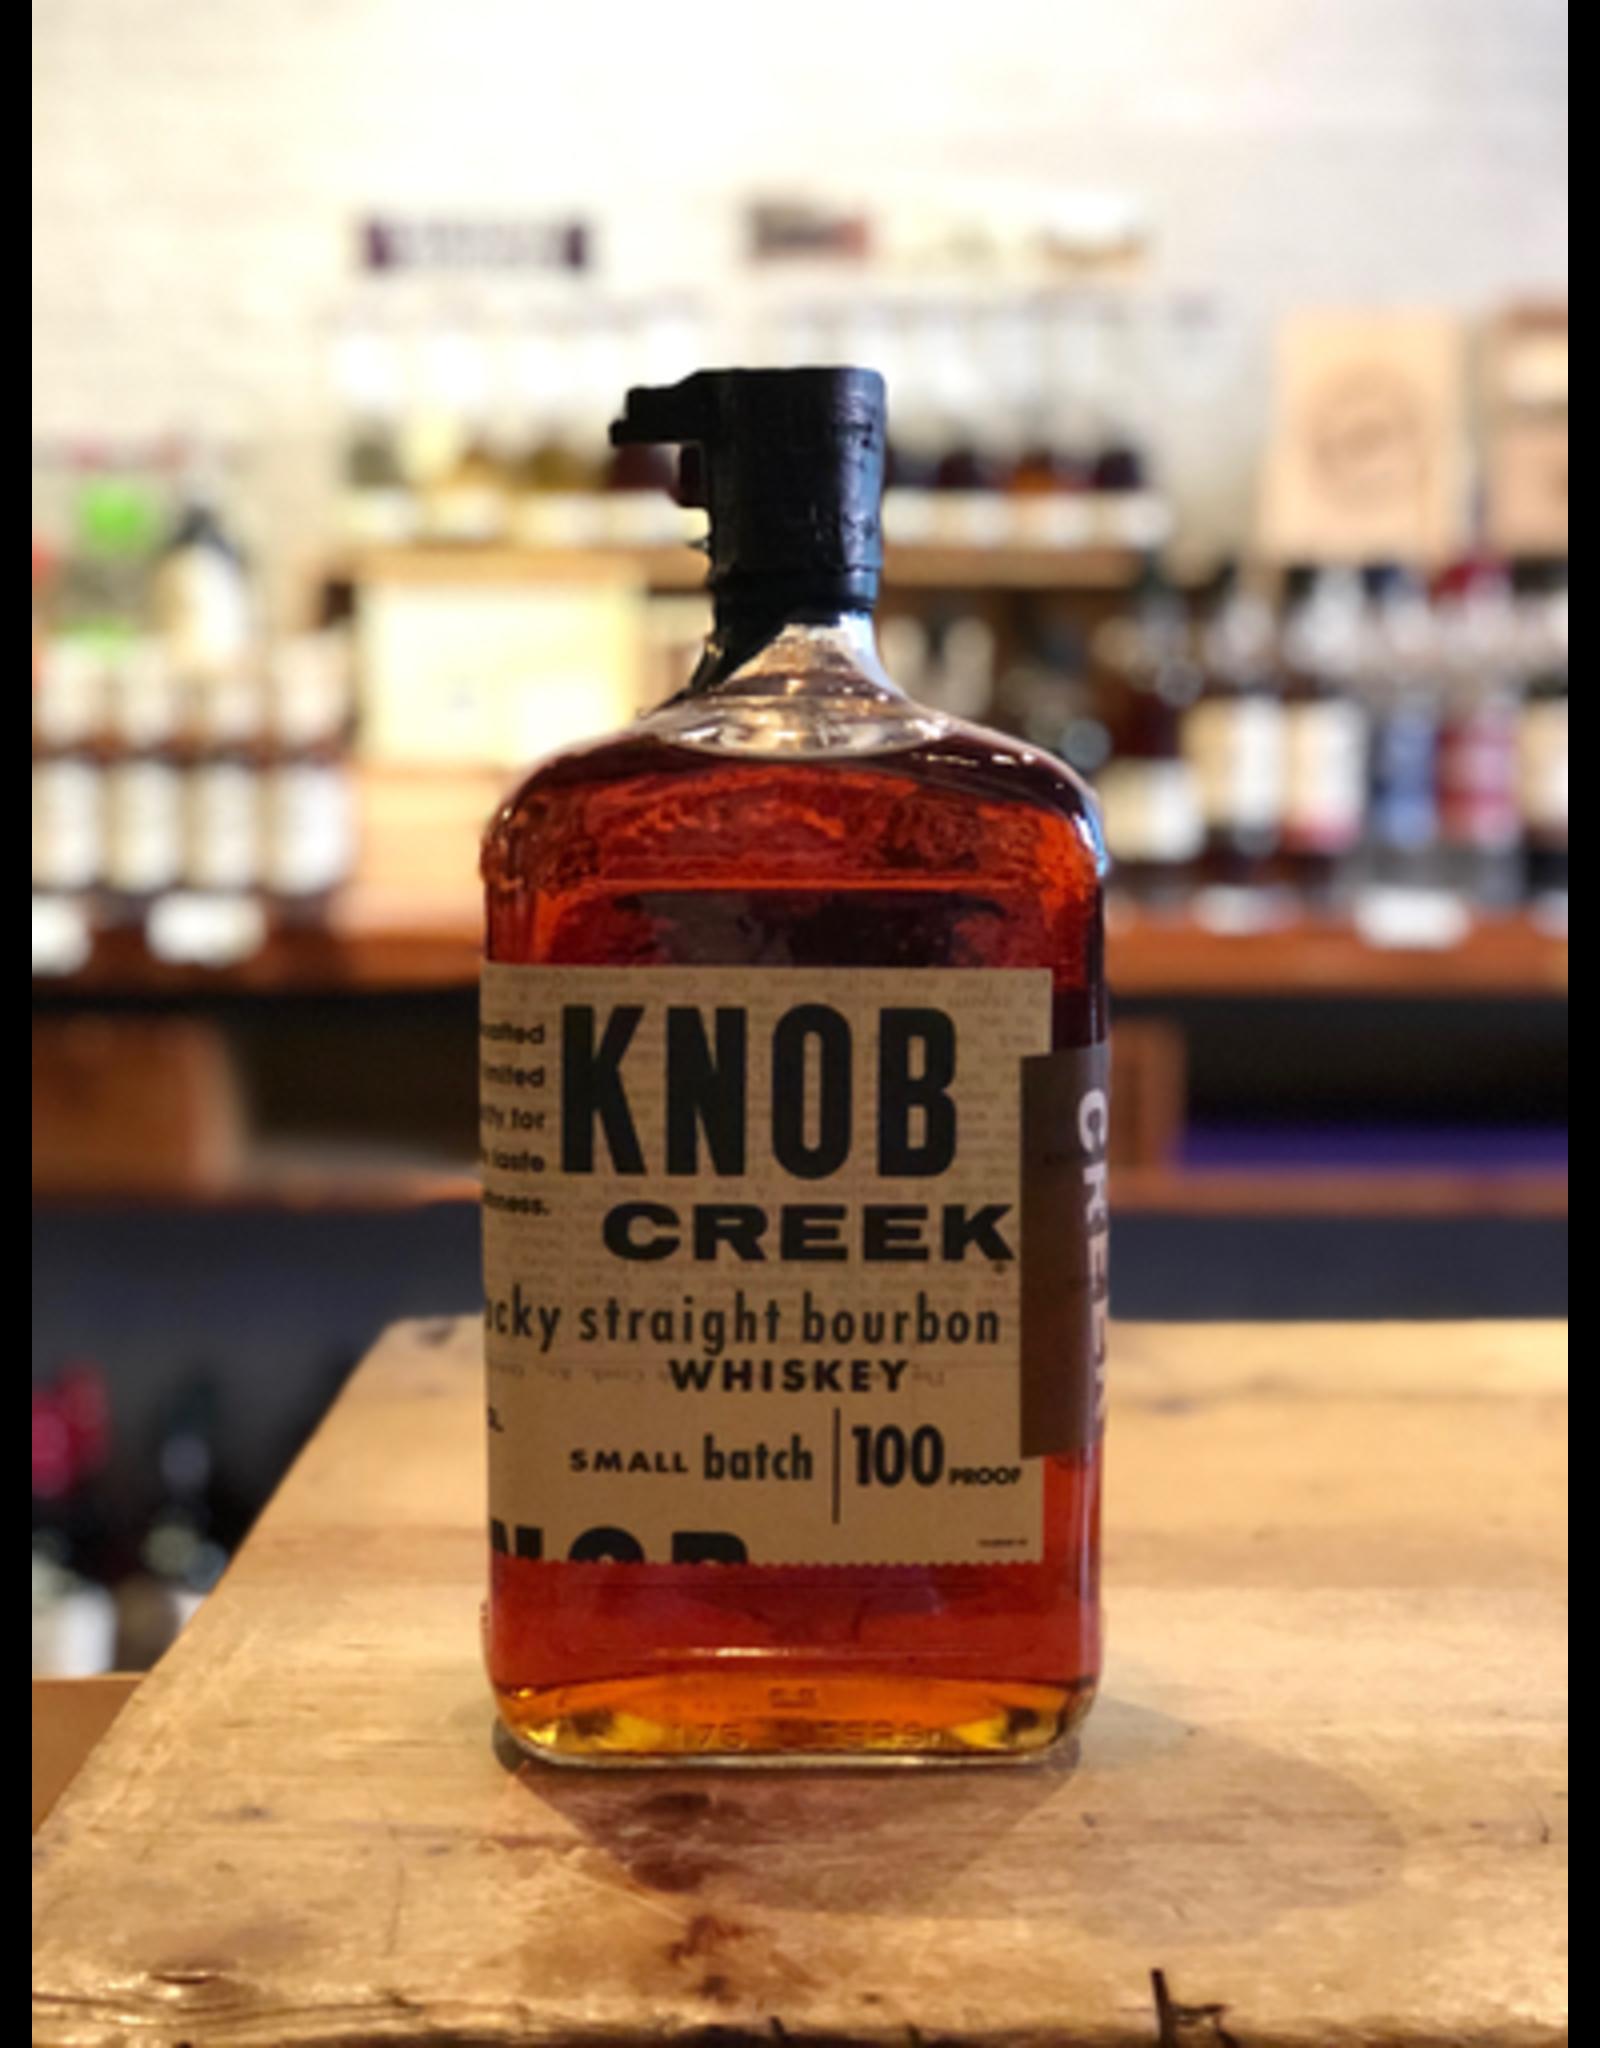 Knob Creek Small Batch Bourbon Whiskey - Clermont, KY (1.75L)